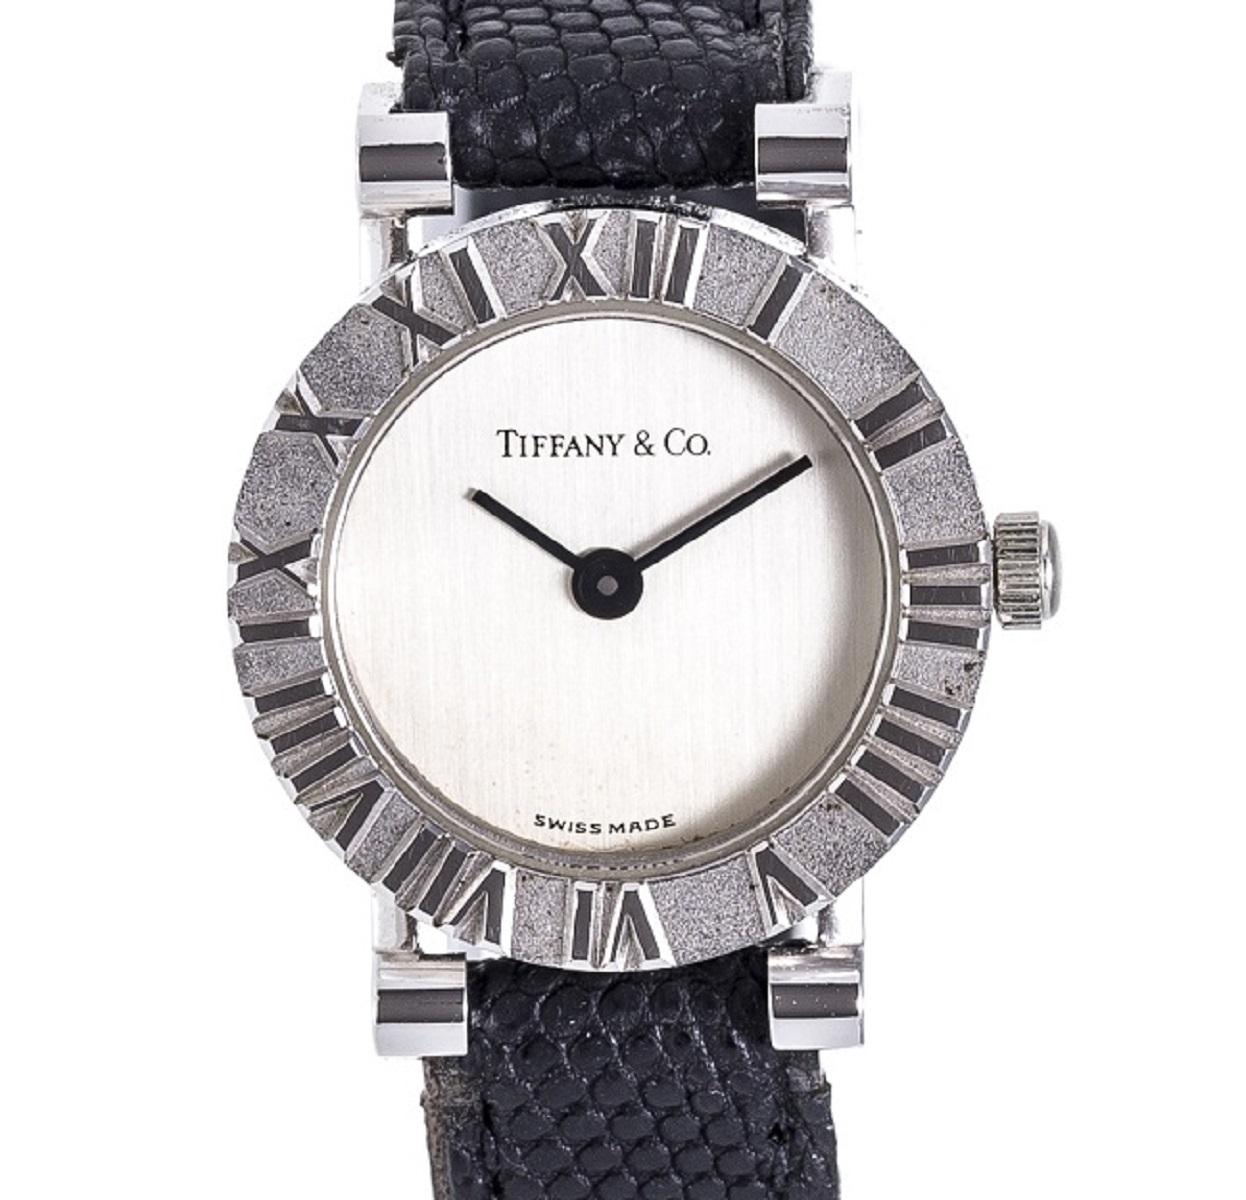 TIFFANY&Co ティファニー アトラス Qz クォーツ レディース 腕時計 シルバー 革ベルト 【トレジャースポット】【中古】